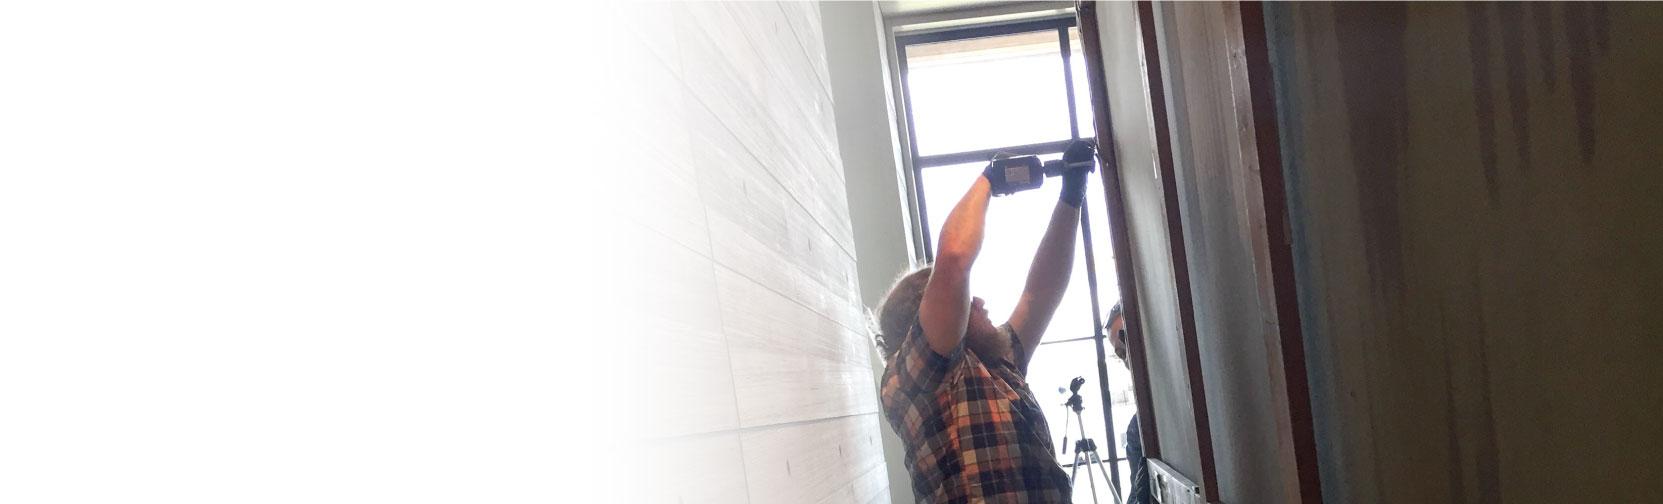 Art Installation Services - Man installing art piece